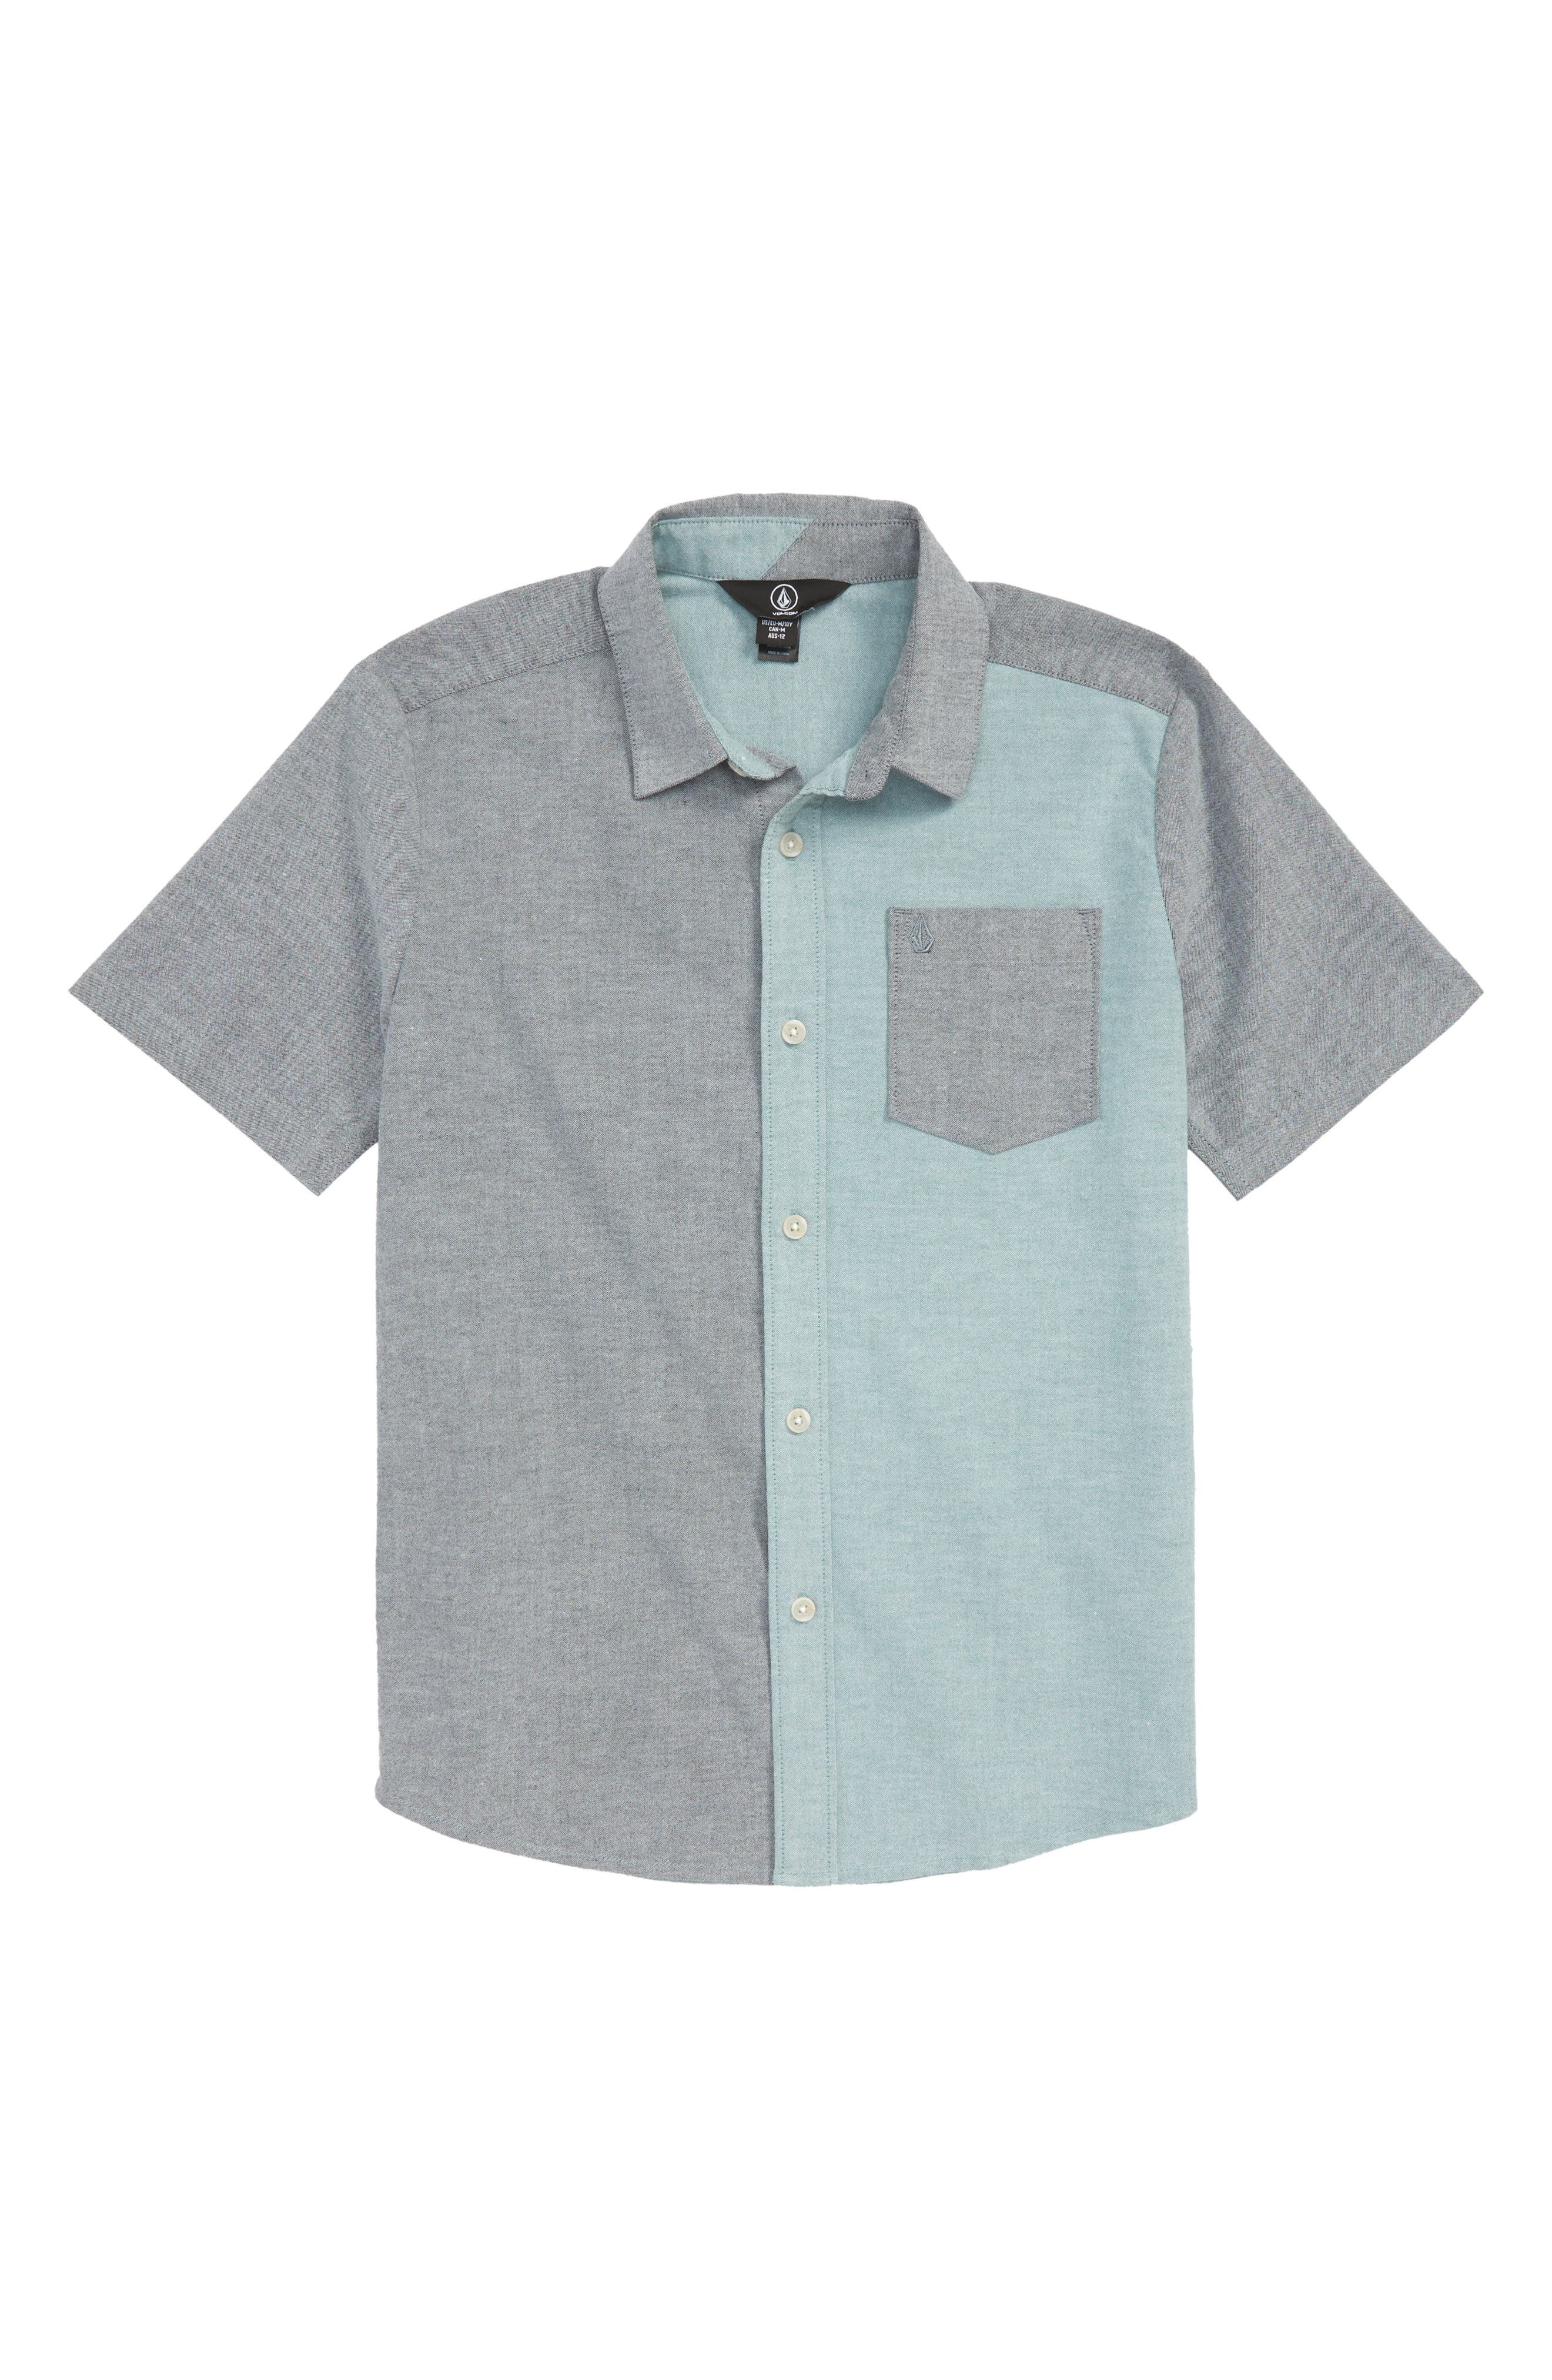 Everett Woven Shirt,                             Main thumbnail 1, color,                             BLUE